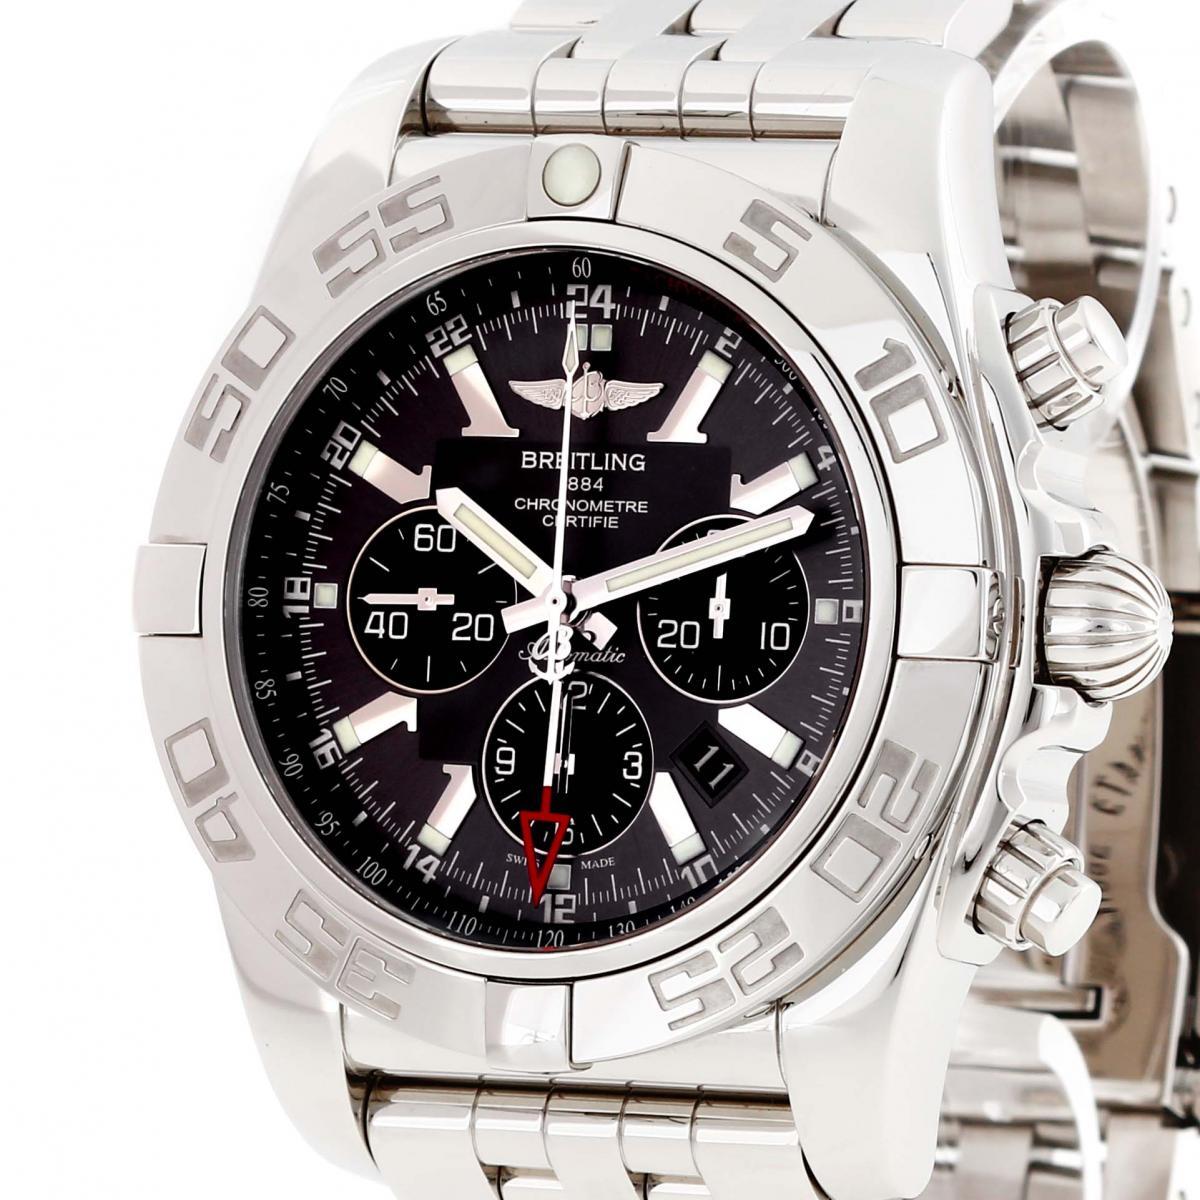 Breitling Chronomat GMT 47 Chronograph Edelstahl Ref. AB041012/F556